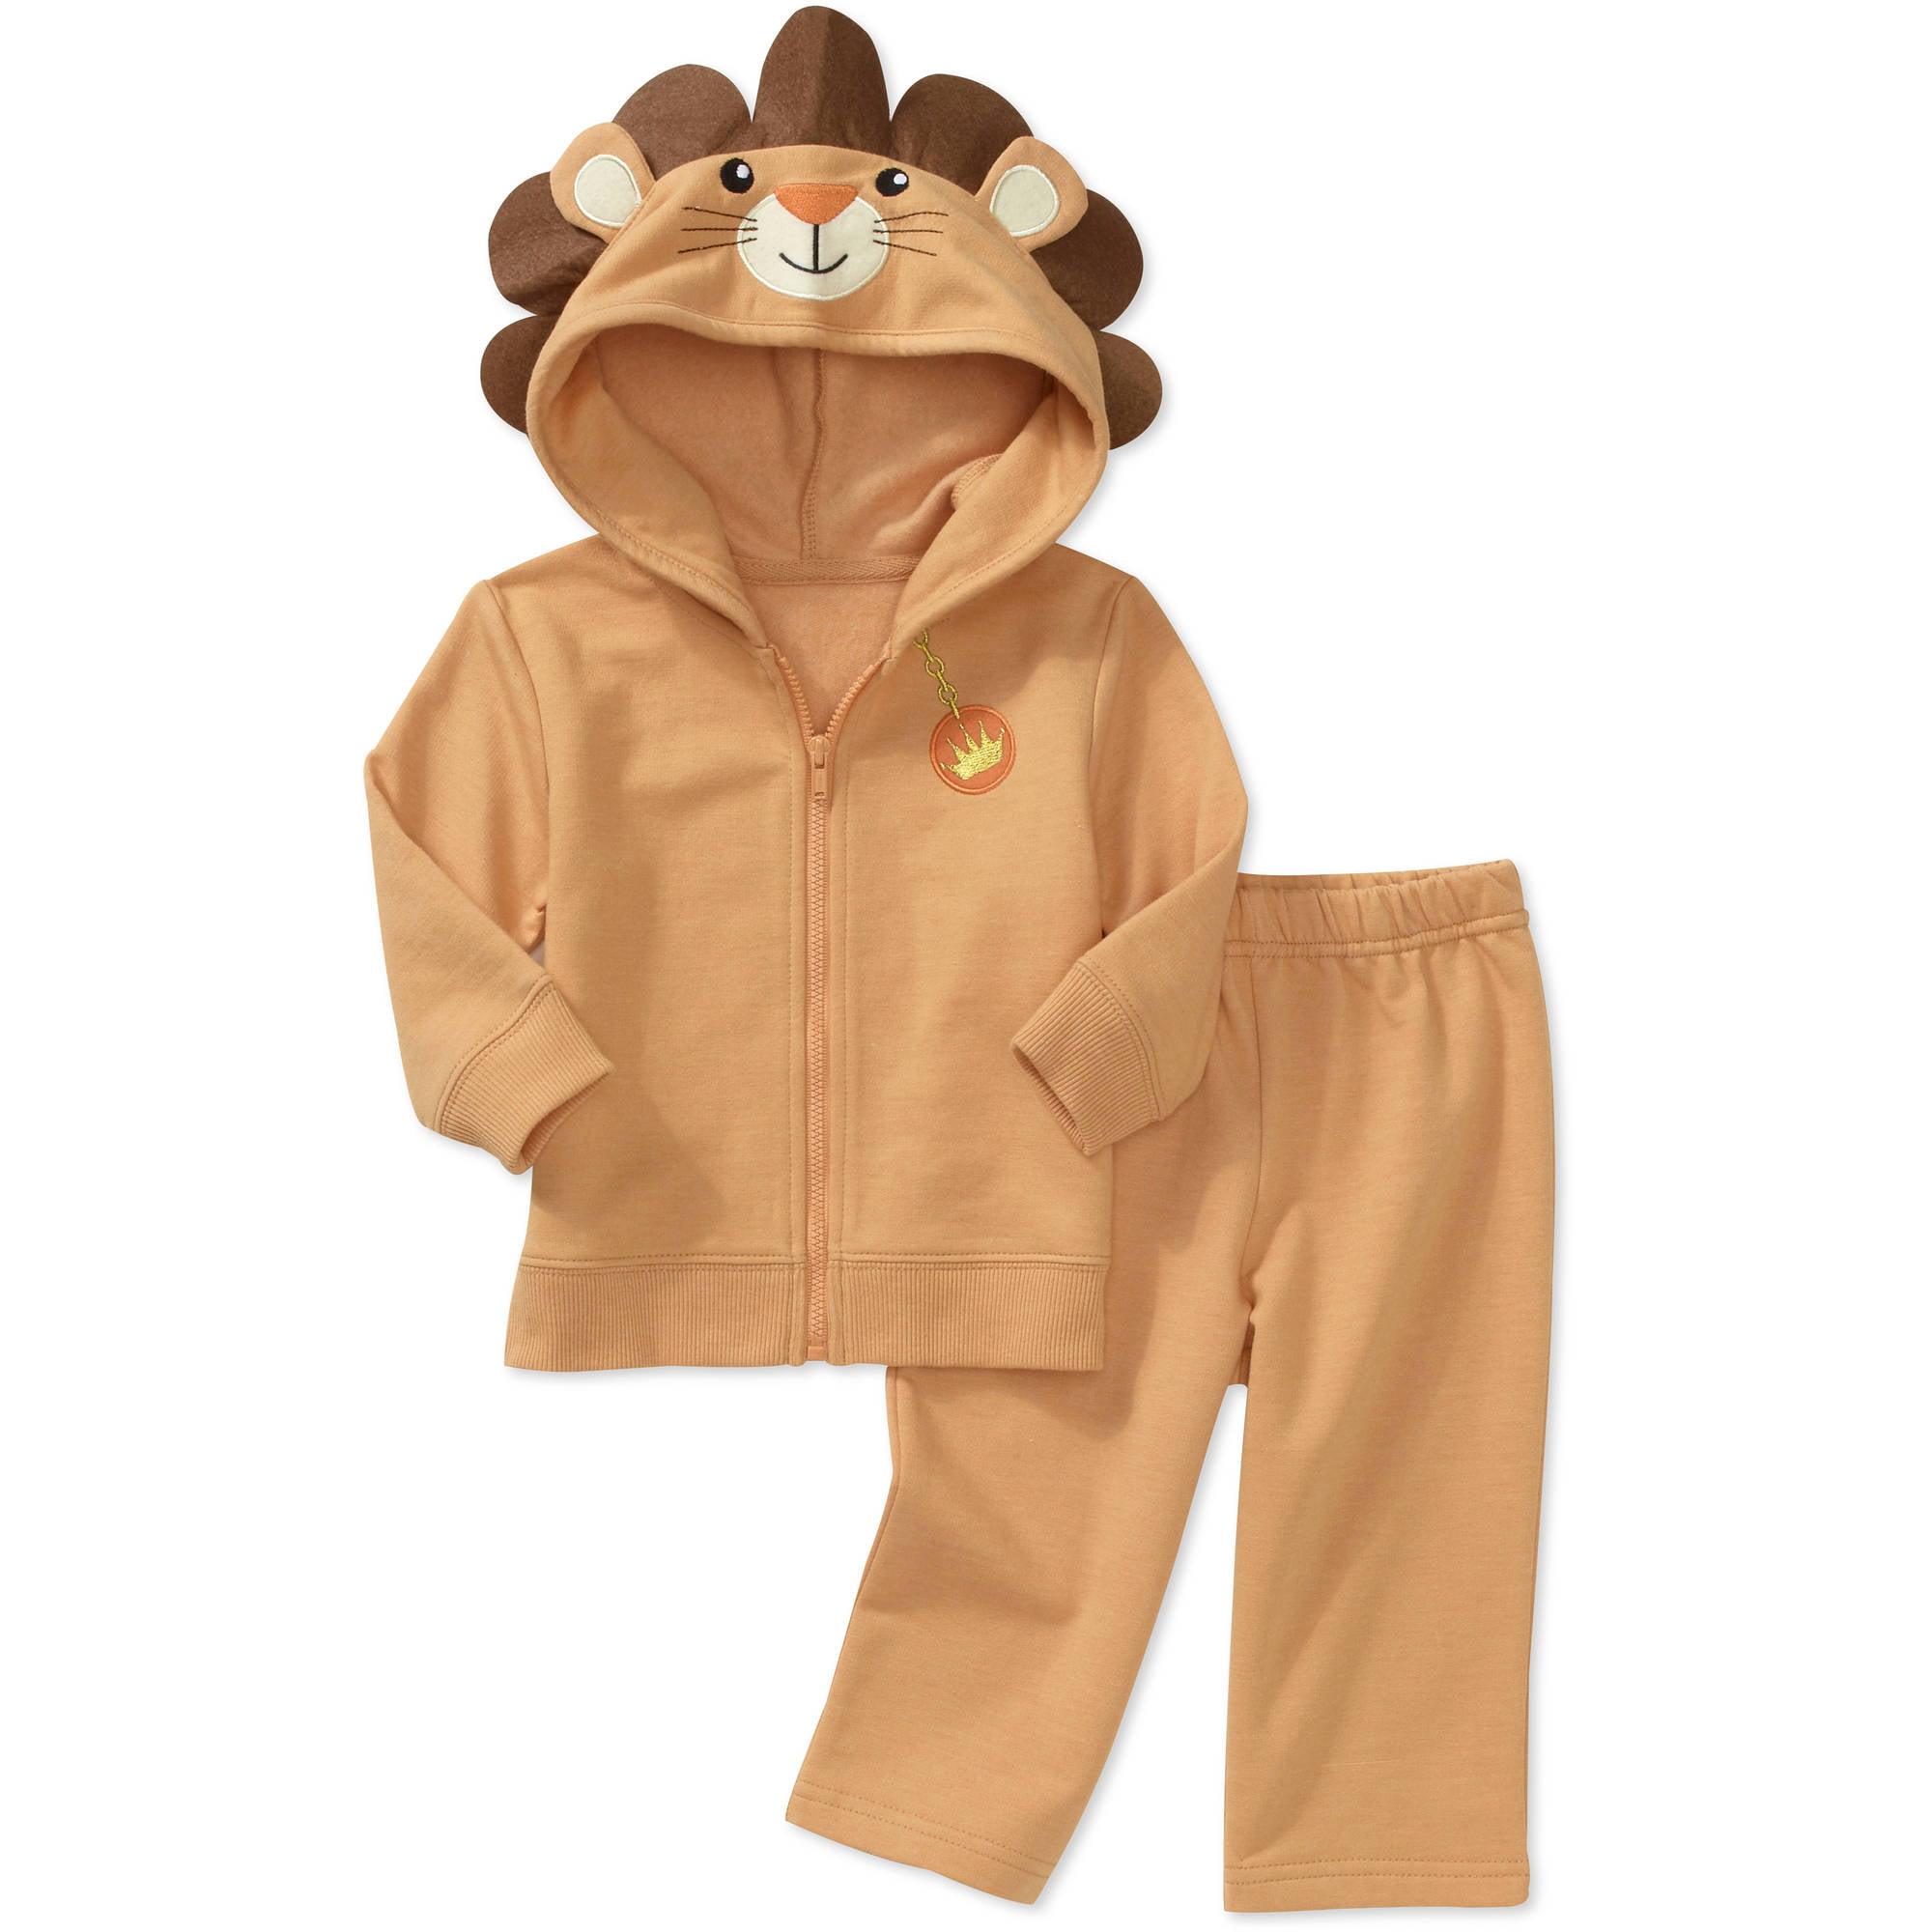 Newborn Boys' 2 Piece Animal Hoodie And